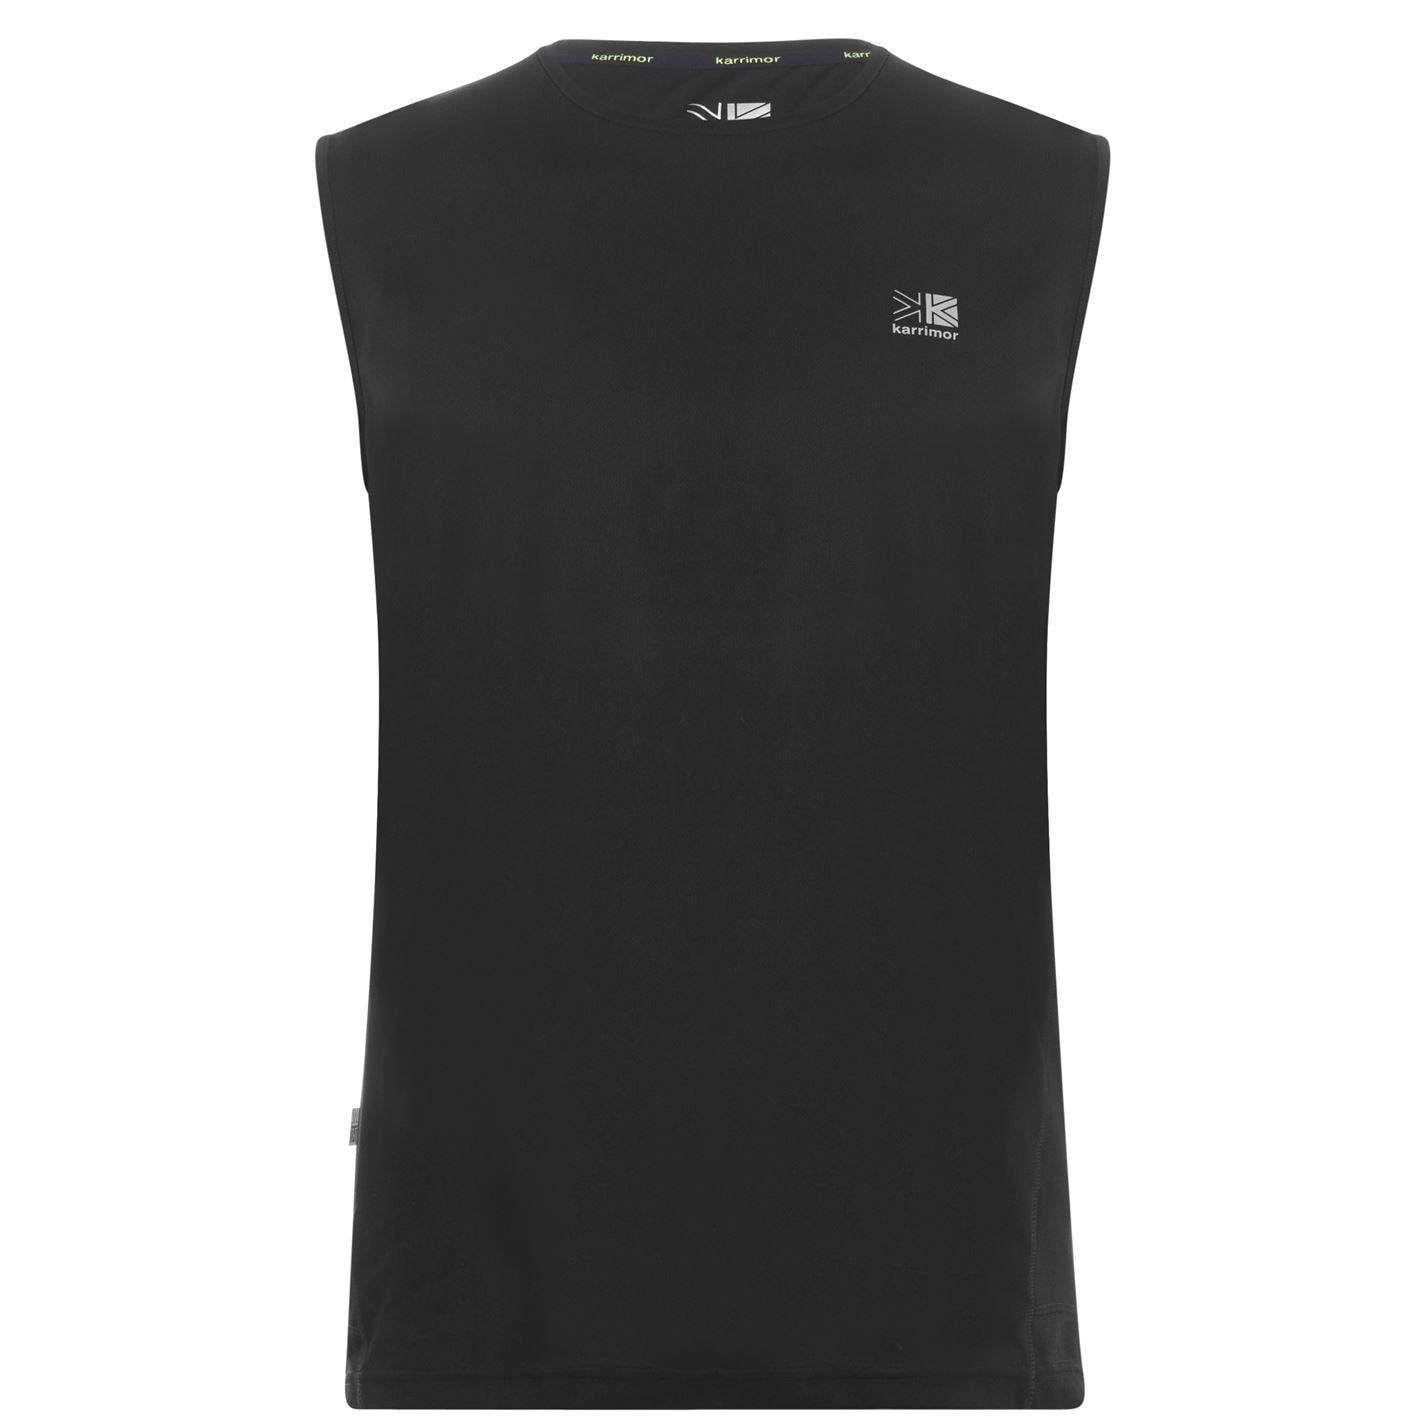 Karrimor Mens Sleeveless Crew Neck Vest Soft Fabric Lightweight T-Shirt Tee Top